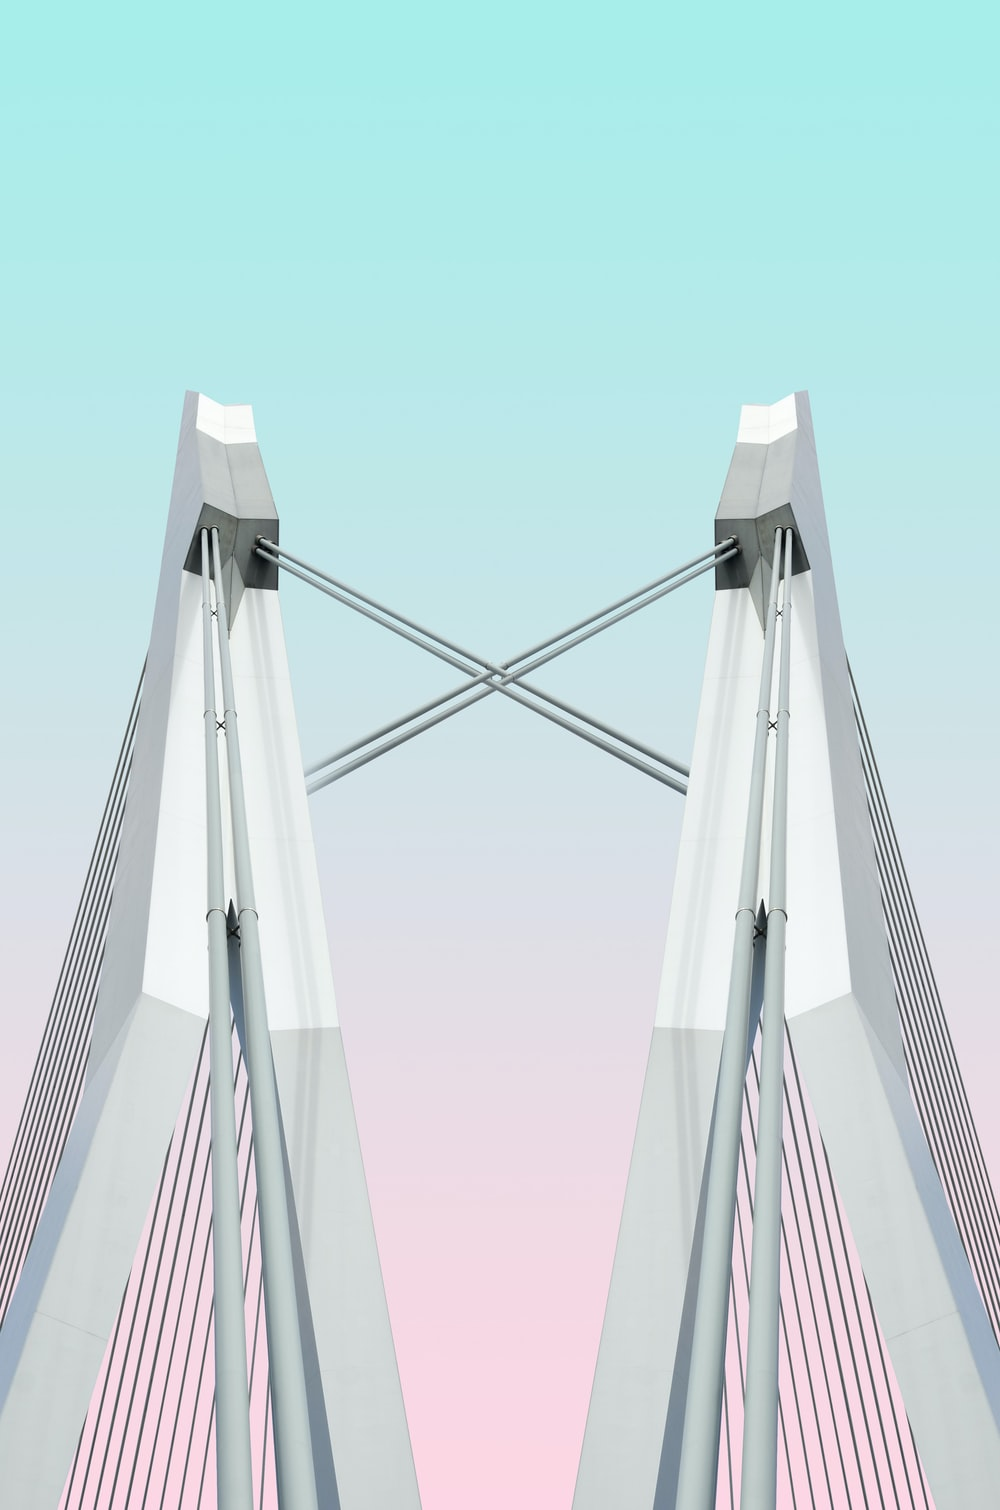 white metal stand illustration